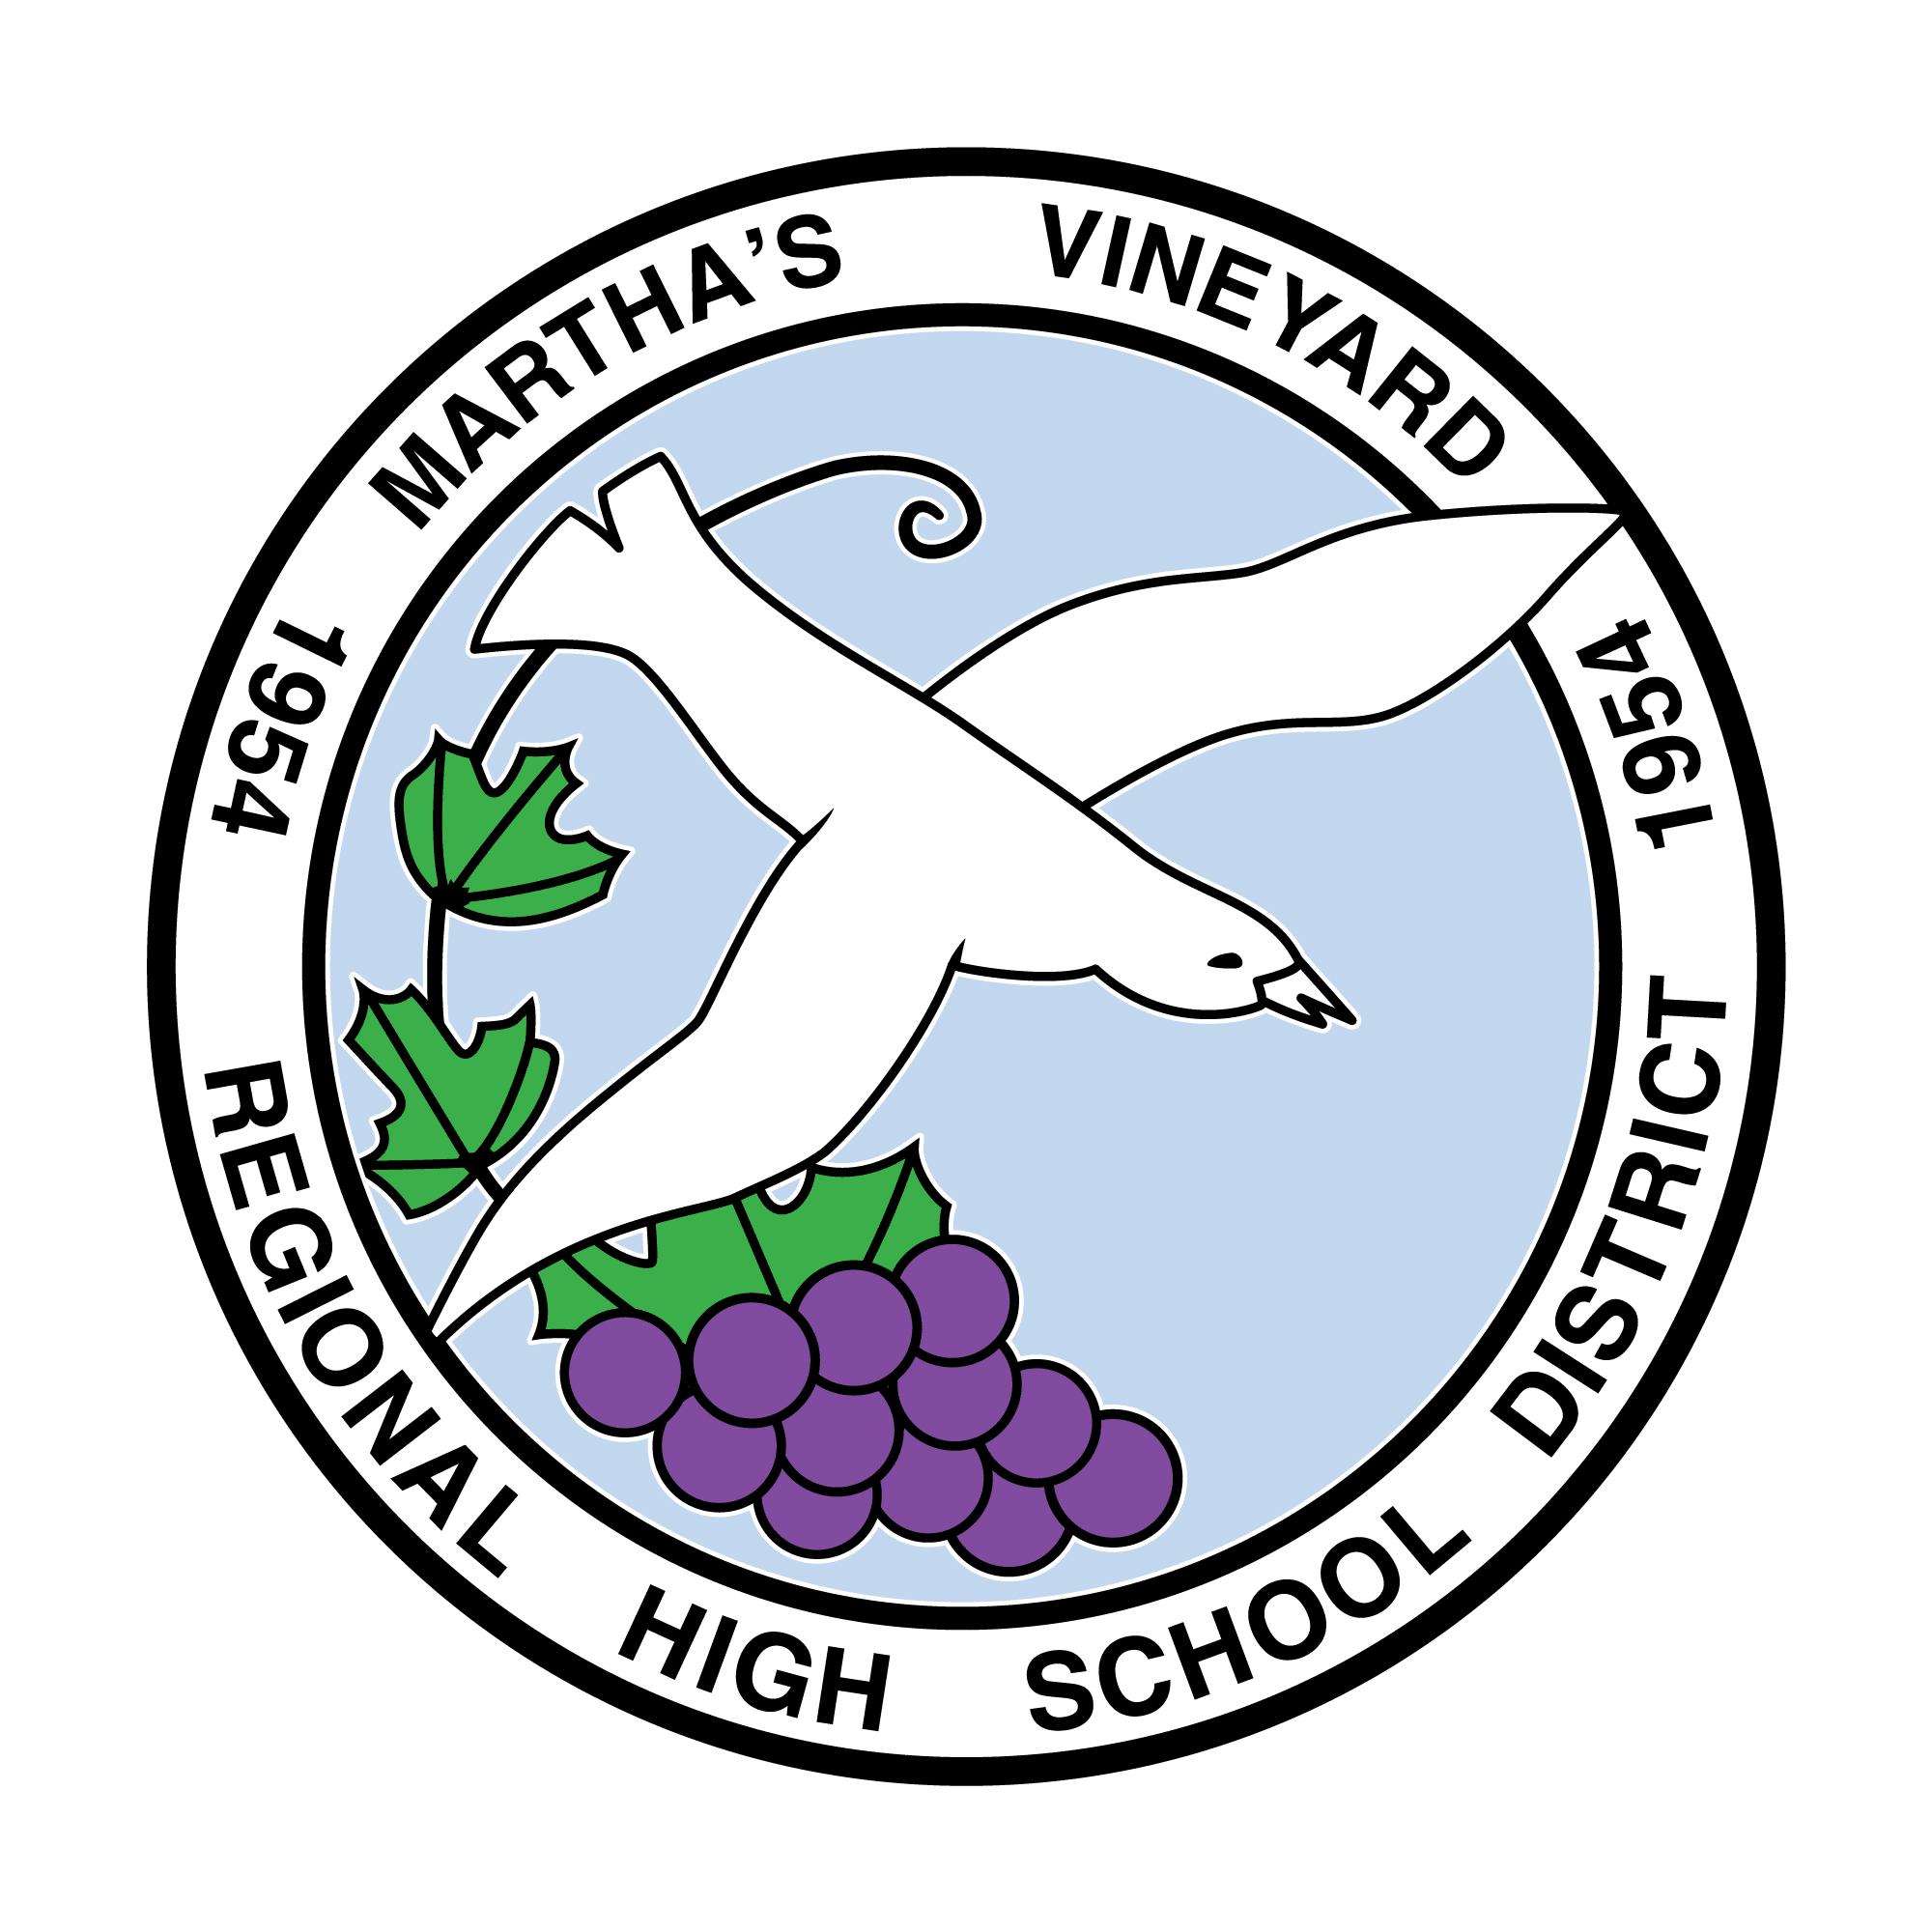 Marthas Vineyard High School logo